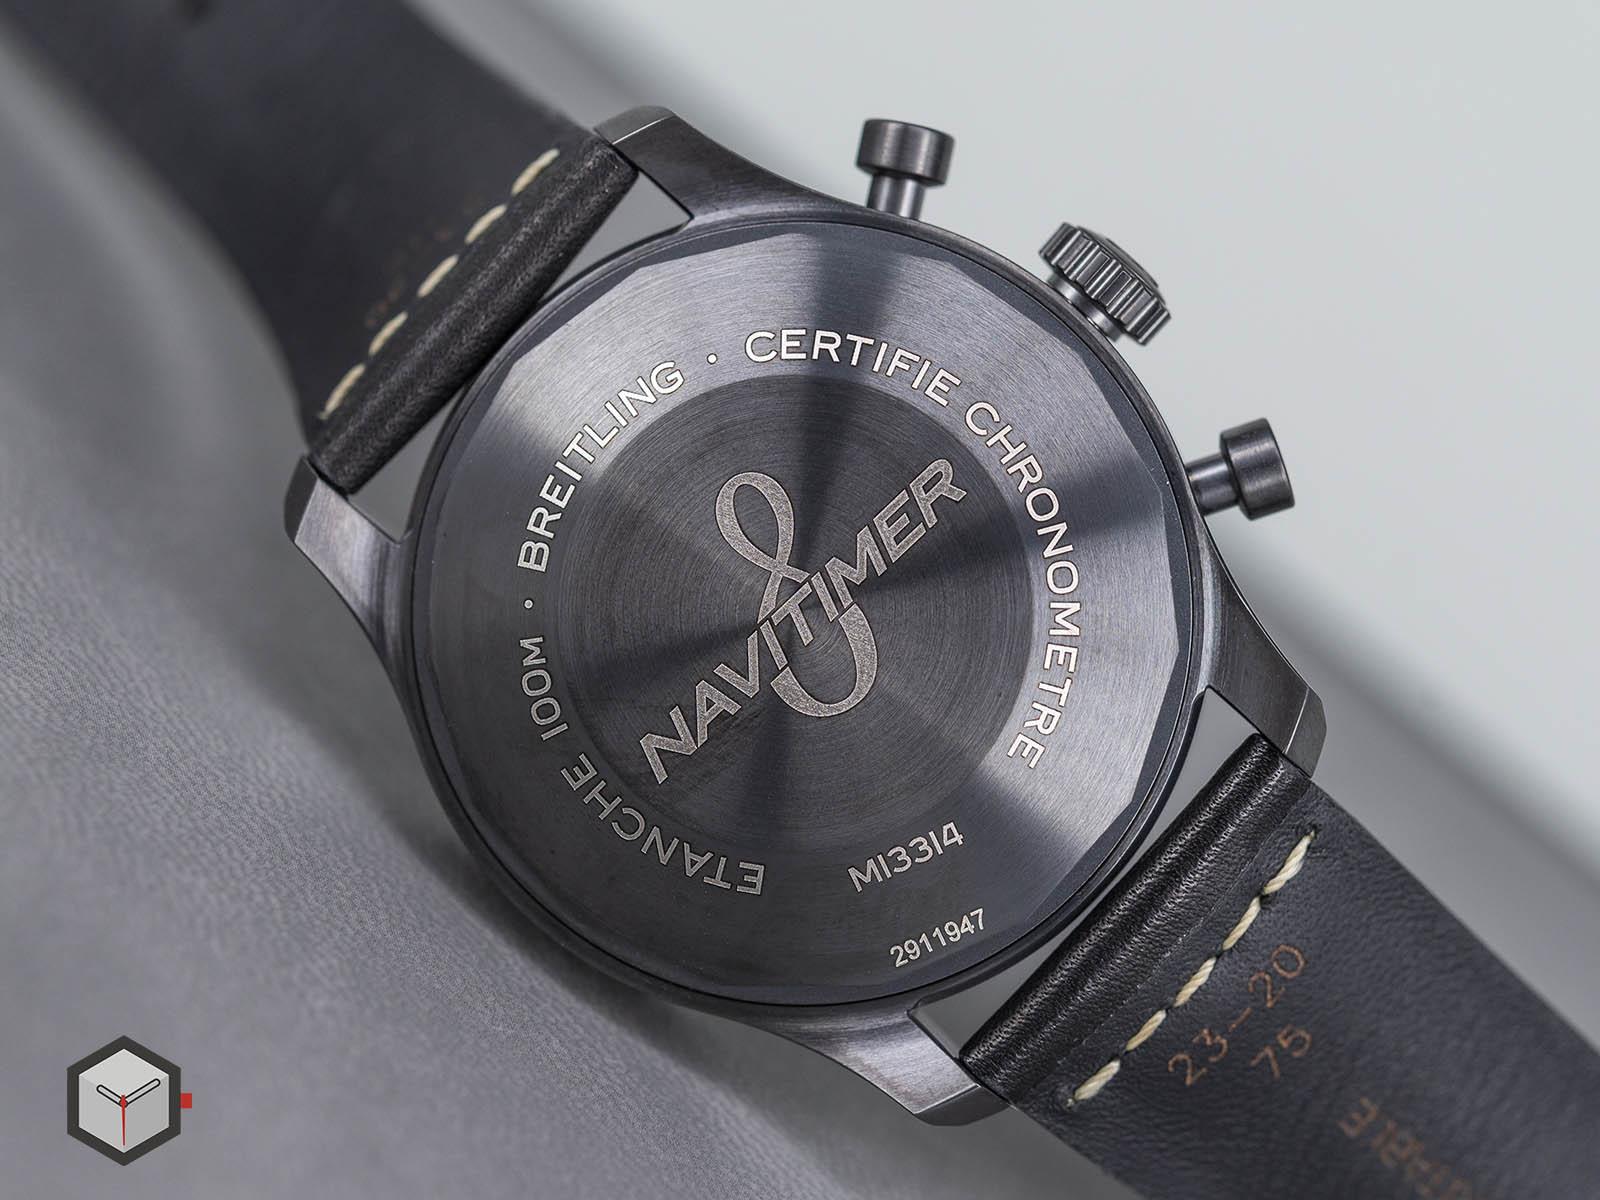 m13314101b1x1-breitling-navitimer-8-chronograph-43-blacksteel-7.jpg